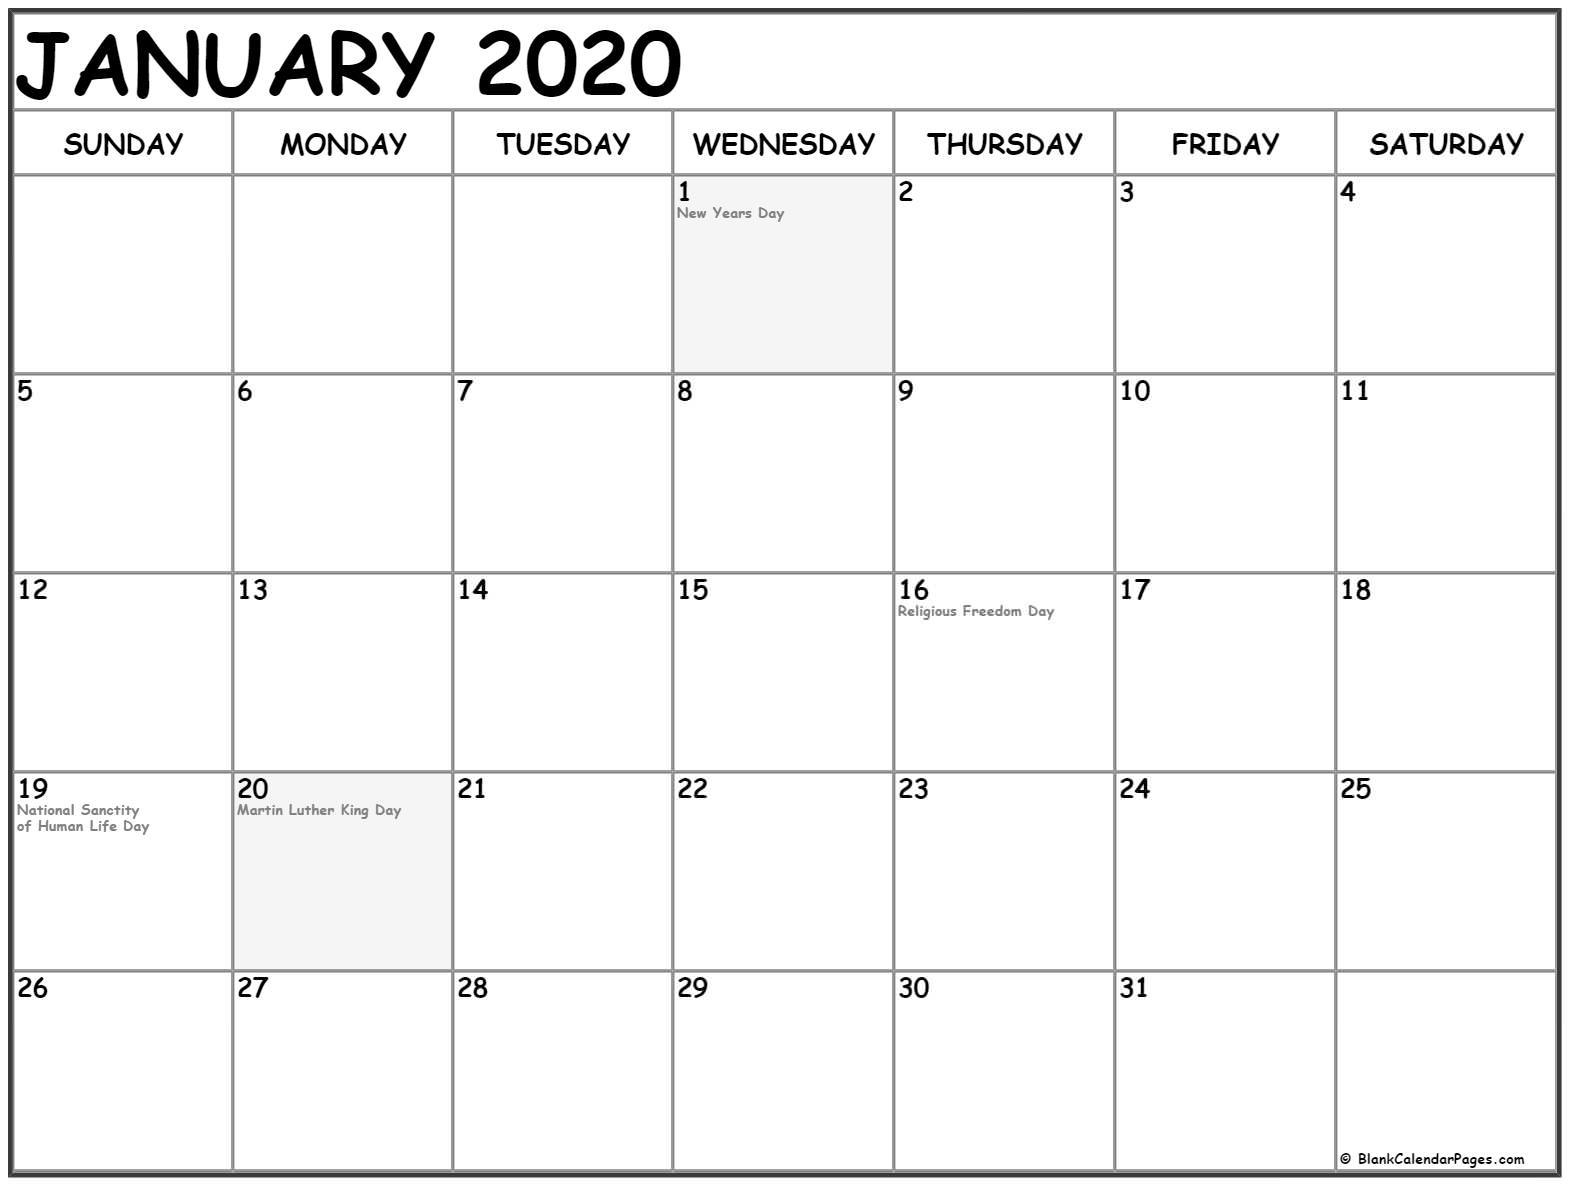 January 2020 Calendar Printable Templates Holidays - July